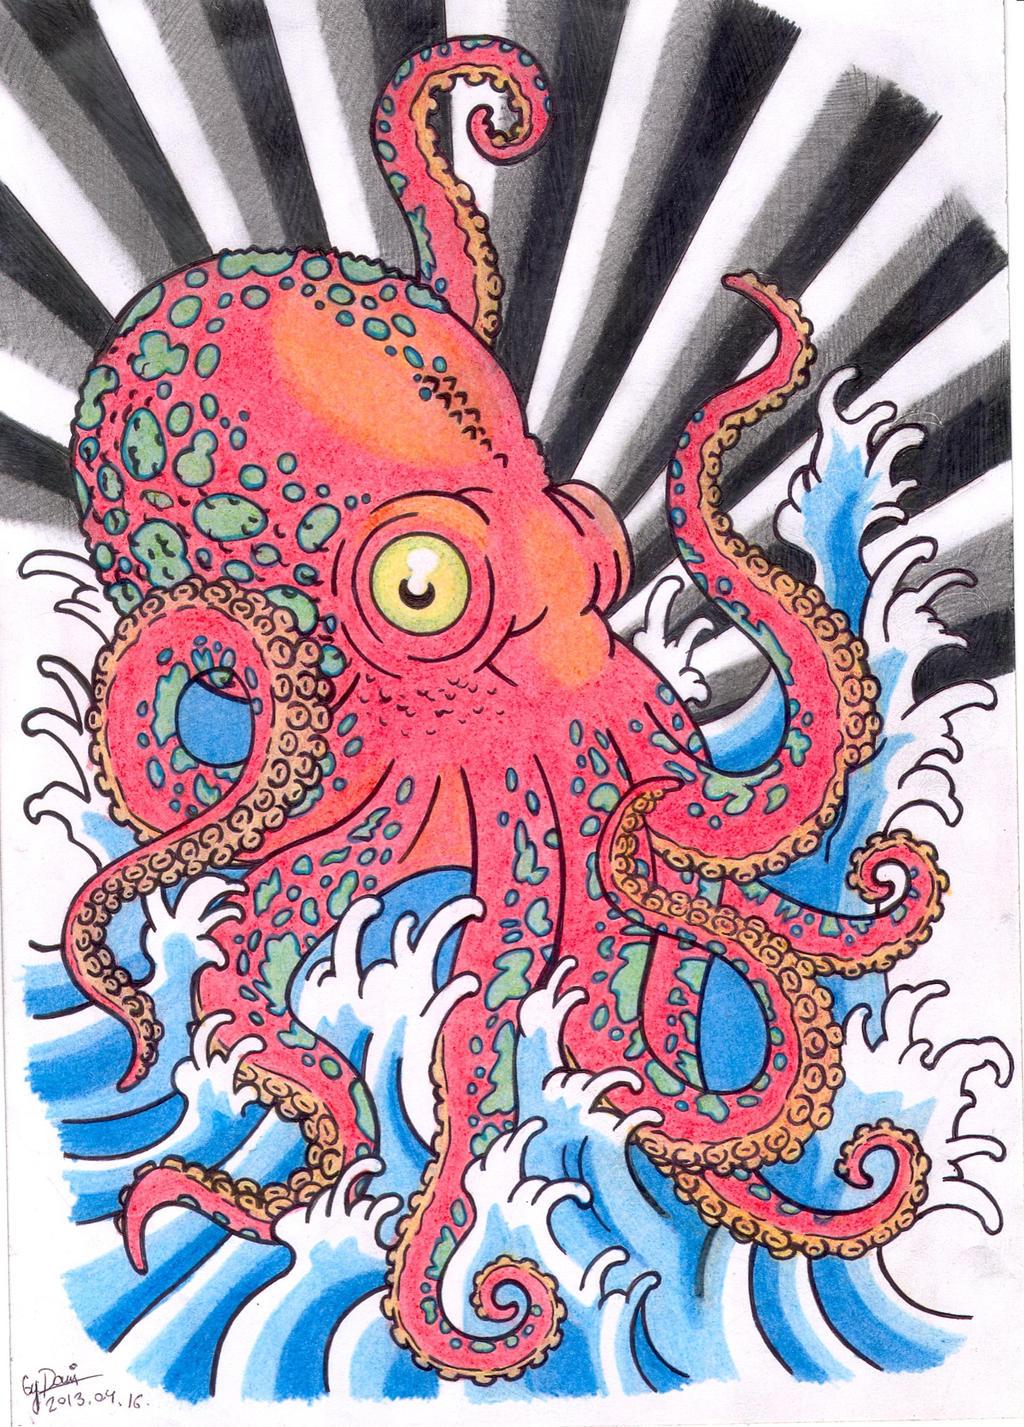 octopus tattoo design by brianjones90 on deviantart. Black Bedroom Furniture Sets. Home Design Ideas